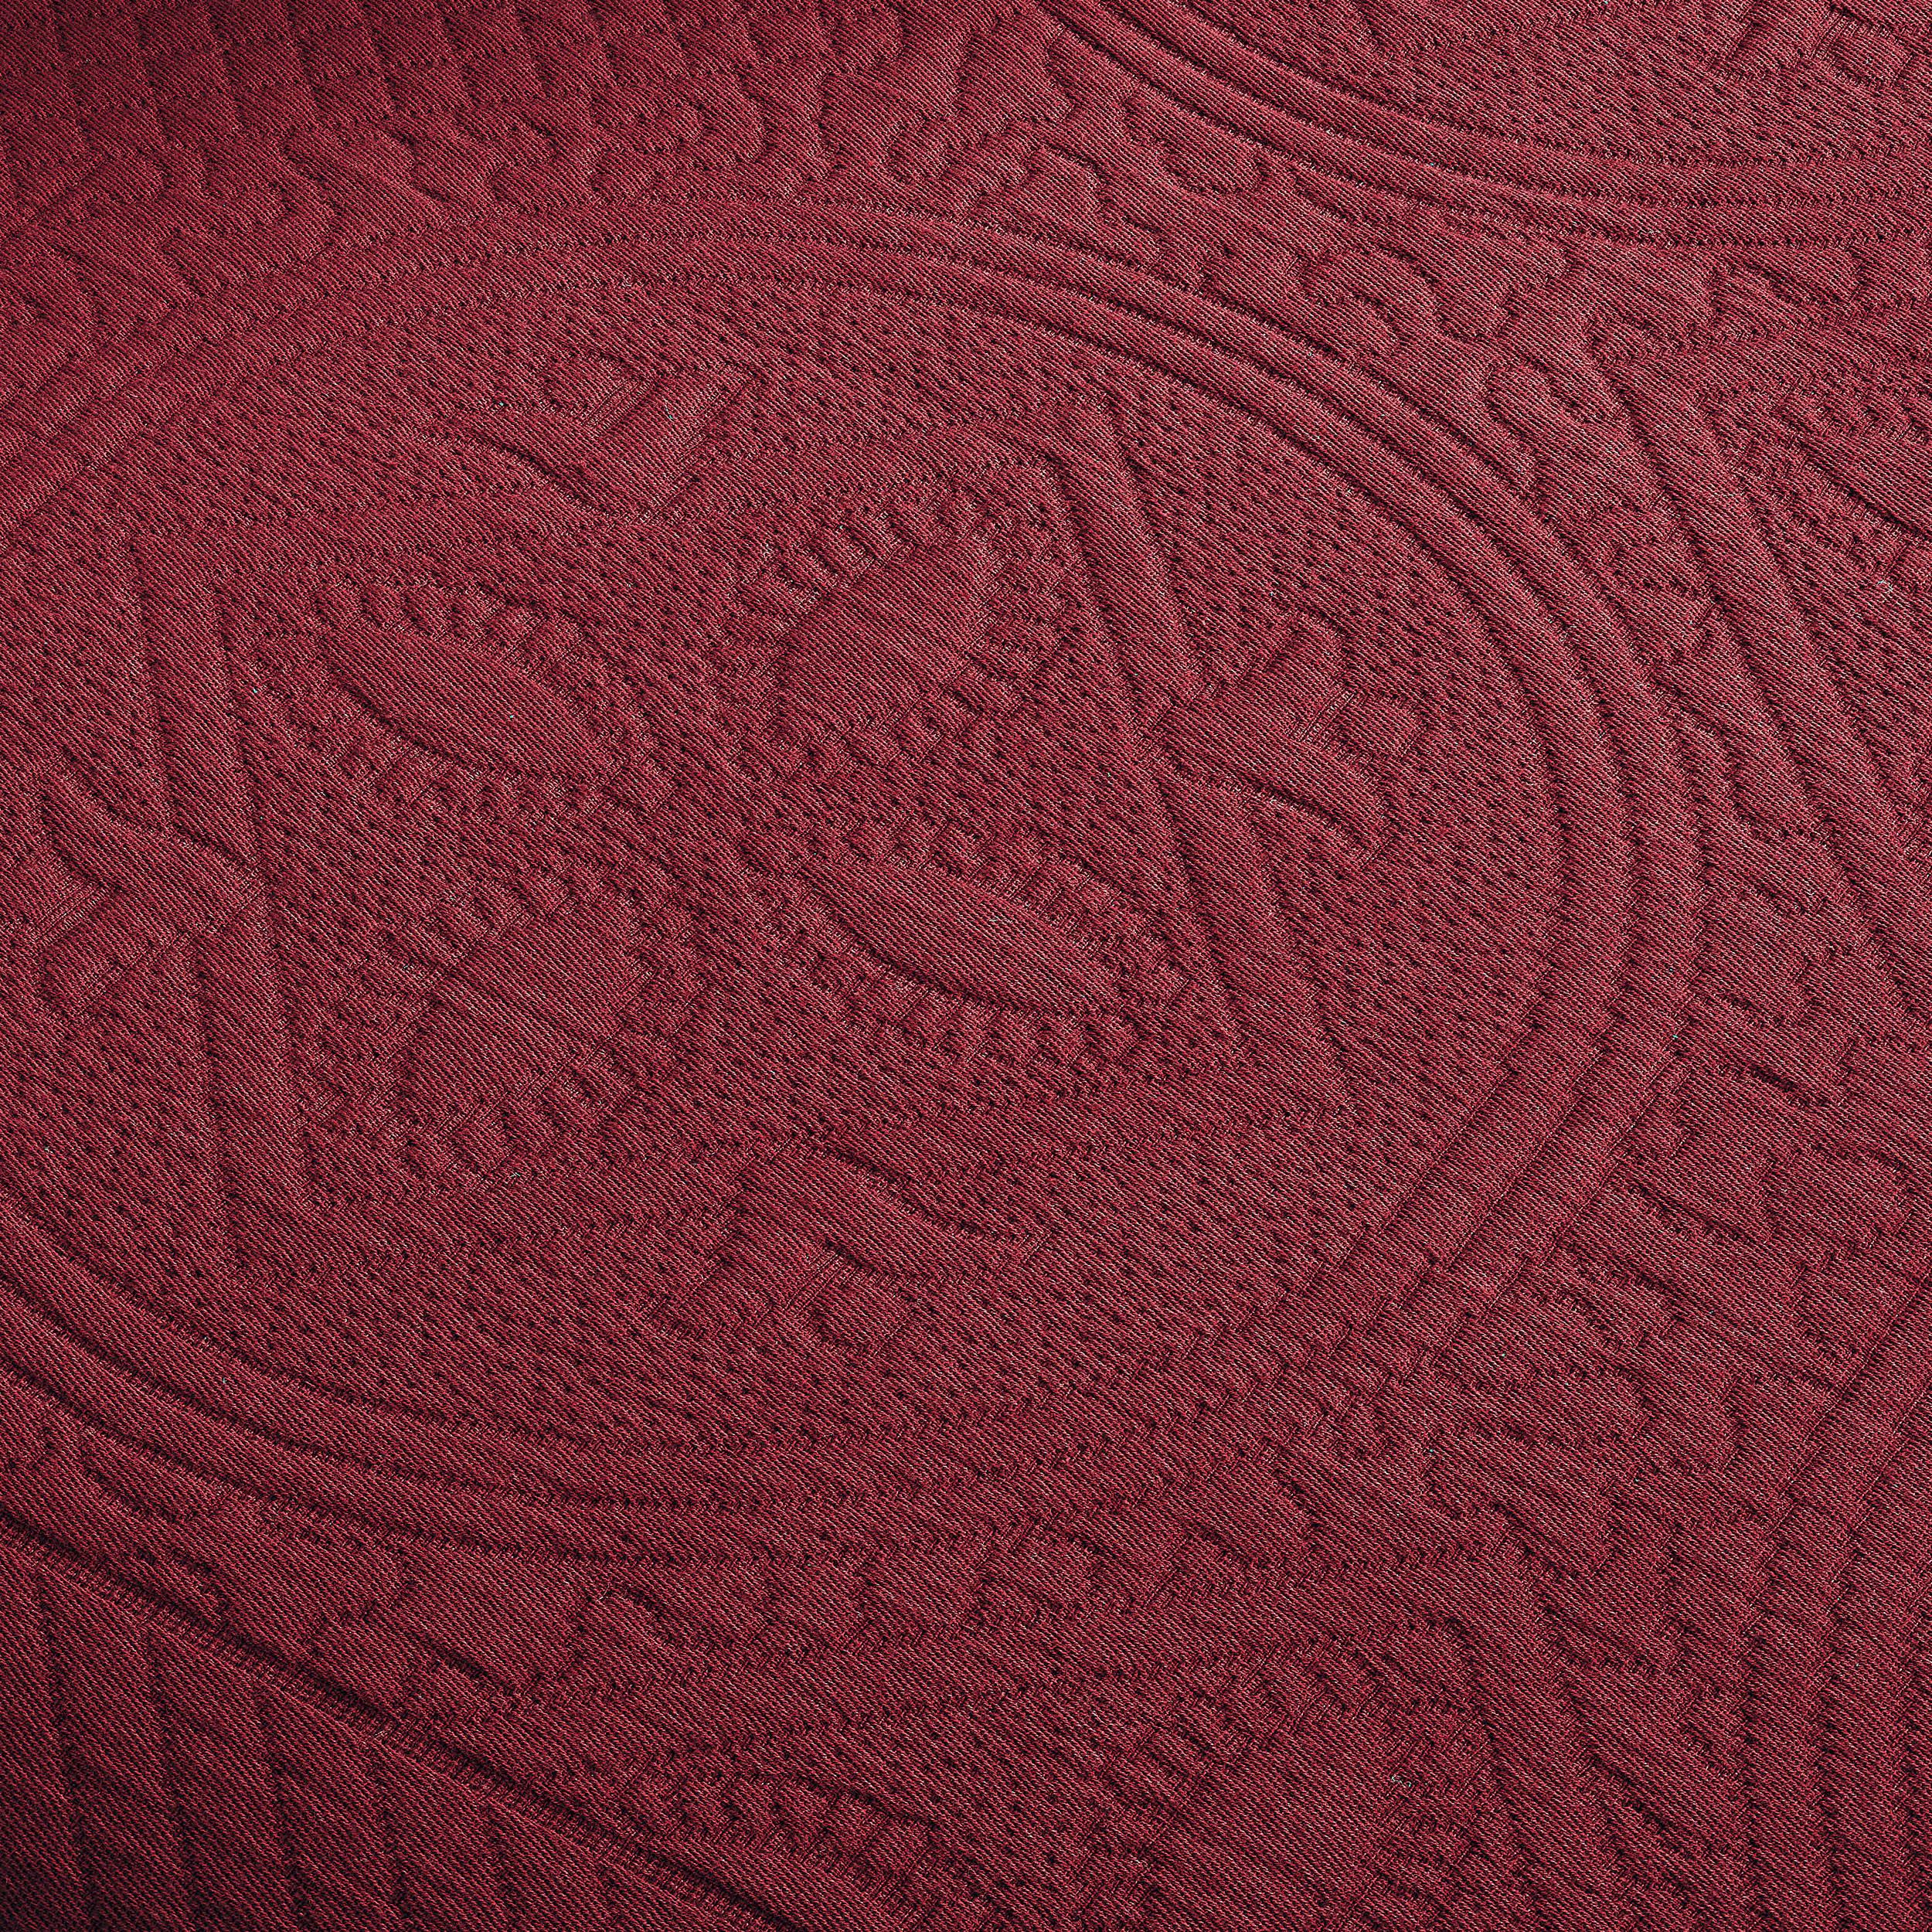 Celtic-Circle-Cotton-Jacquard-Matelasse-Scalloped-Bedspread-Set thumbnail 8